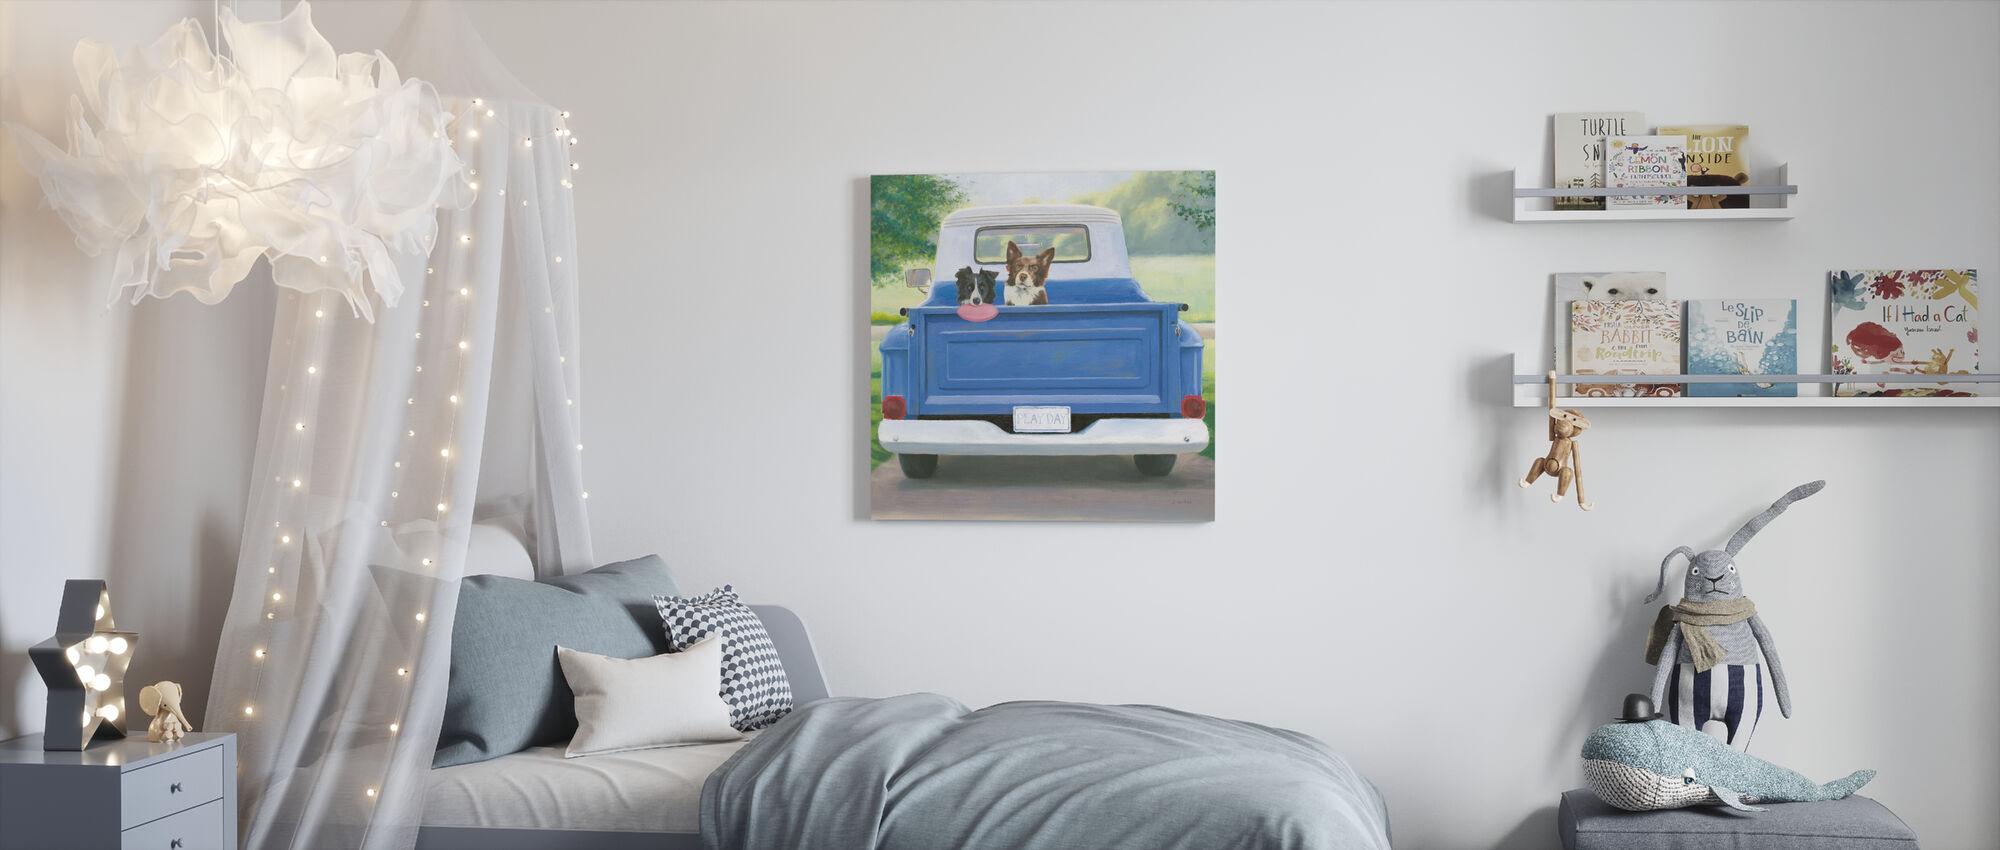 Speeldag - Canvas print - Kinderkamer